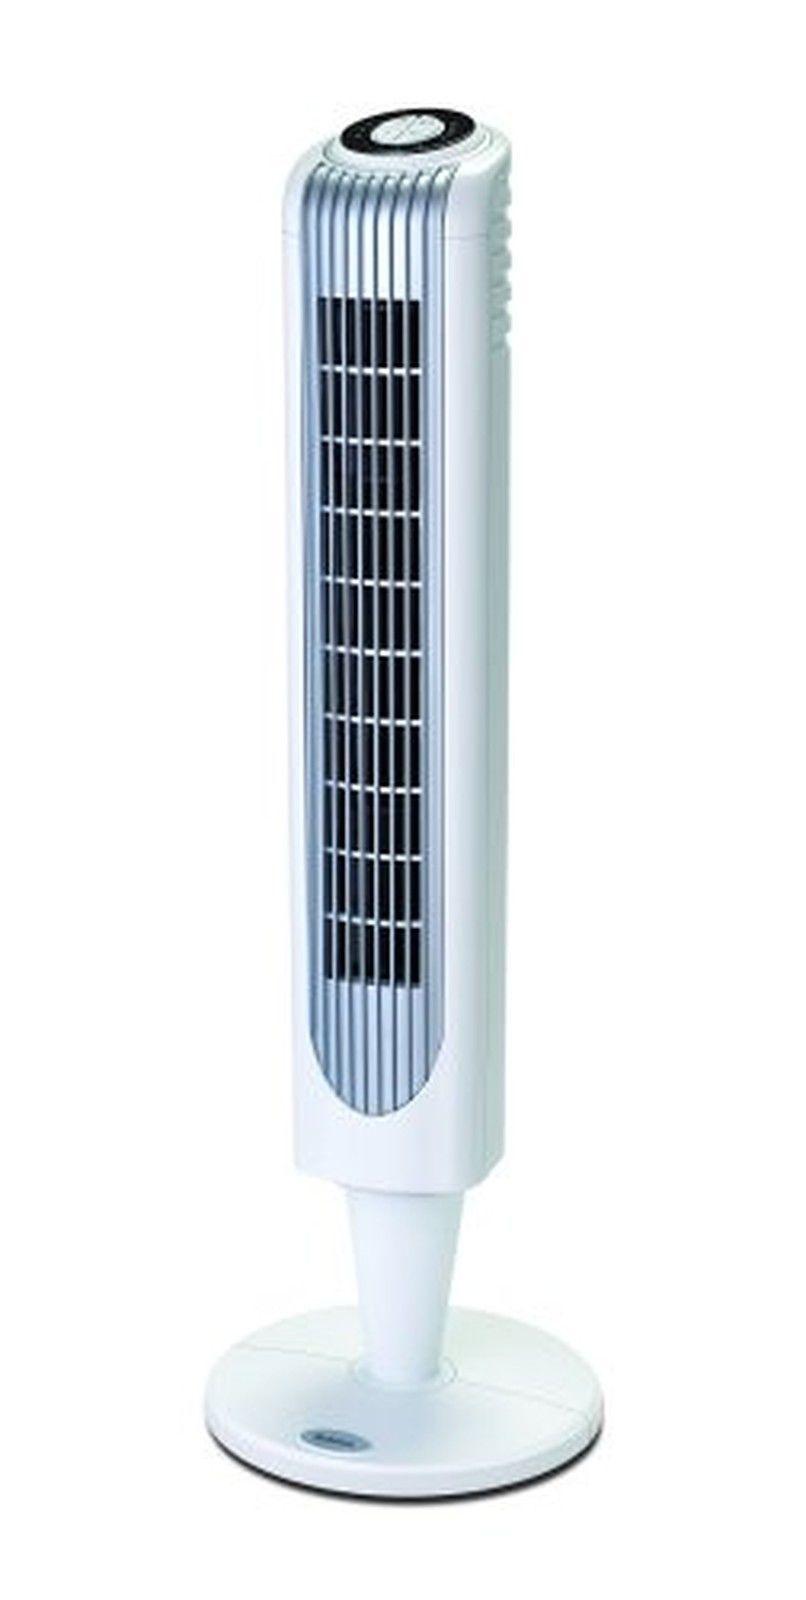 Portable Oscillating Tower Fan Air Conditioner Floor Remote